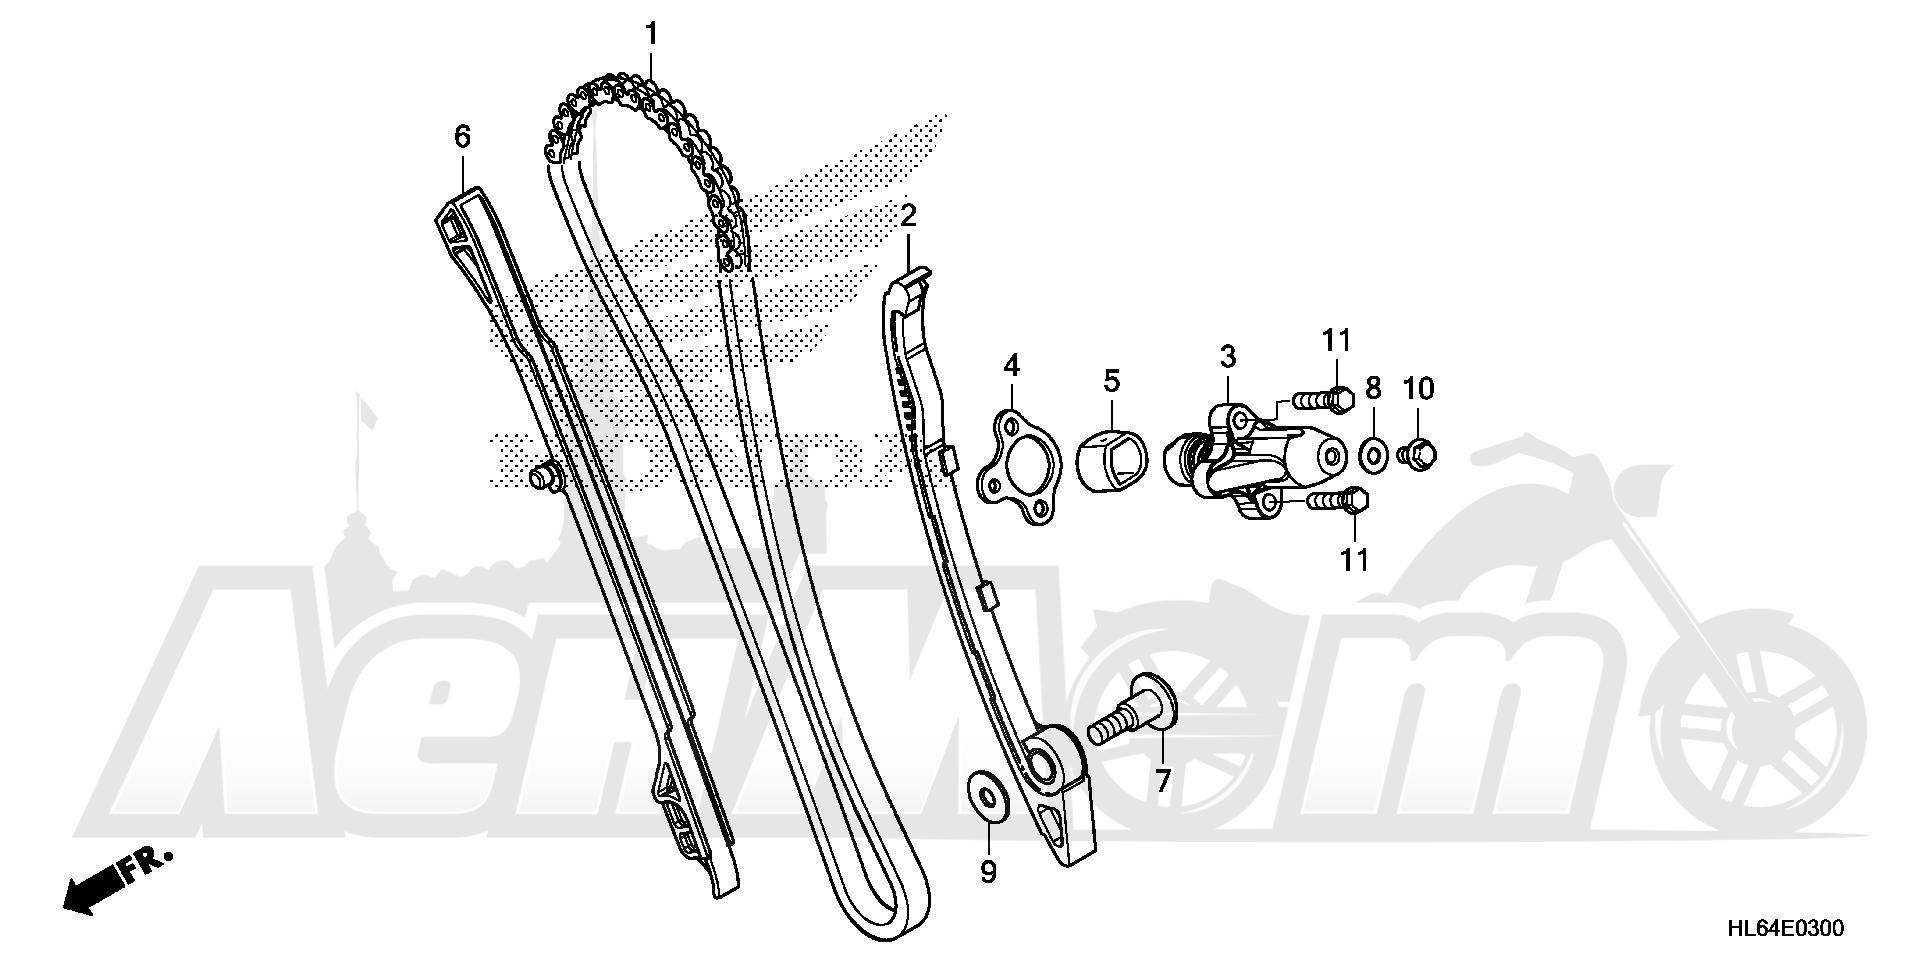 Запчасти для Квадроцикла Honda 2019 SXS1000S2X Раздел: CAM CHAIN AND TENSIONER | цепь грм и натяжитель